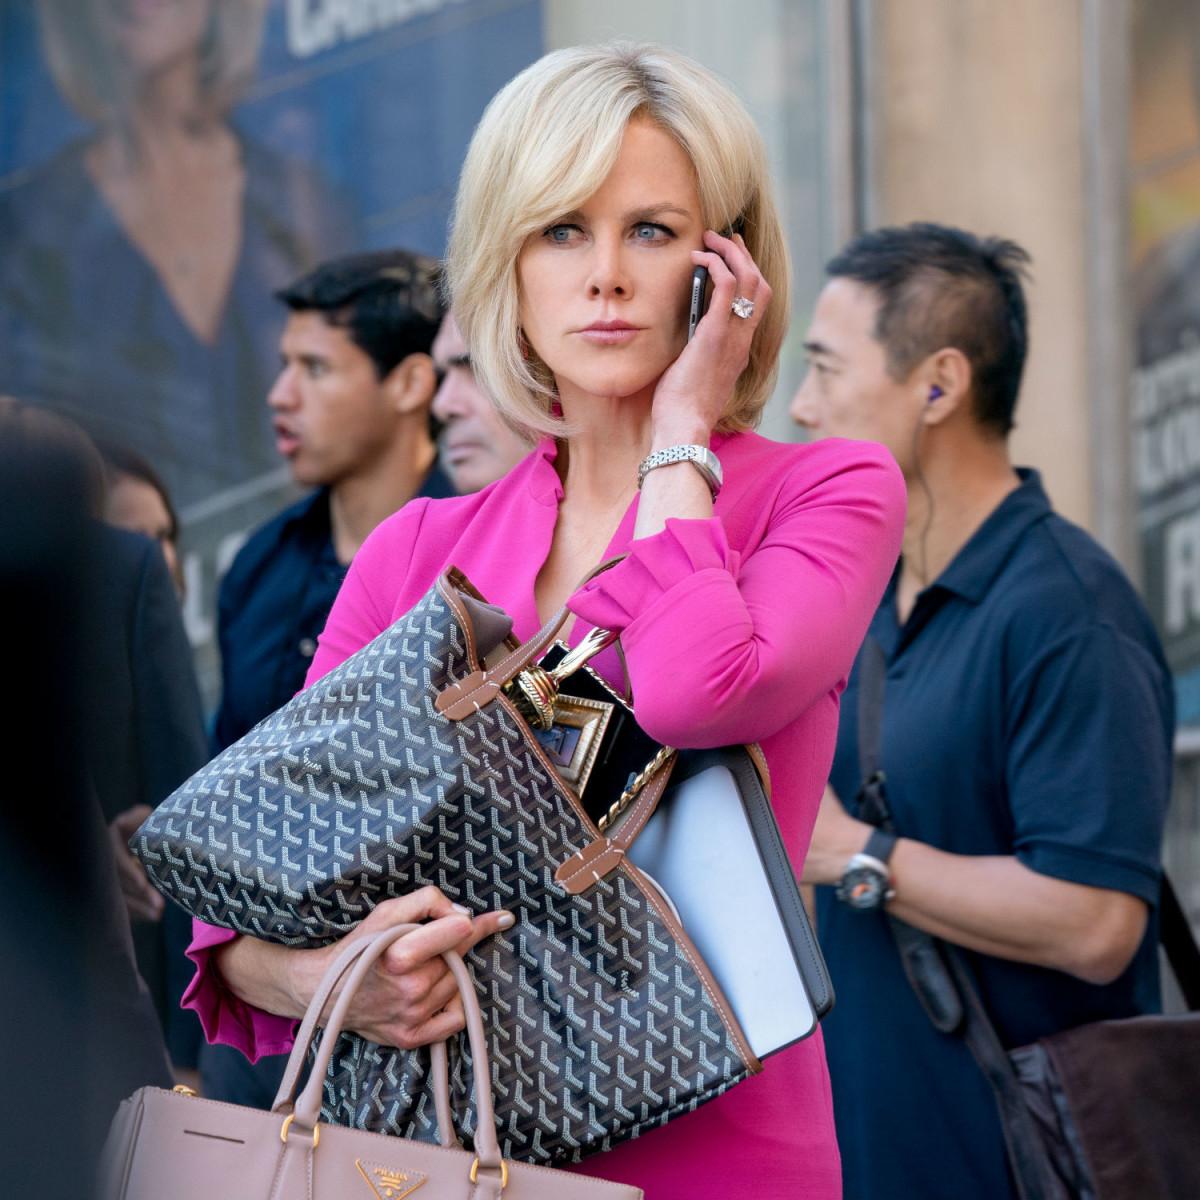 Nicole Kidman in Bombshell